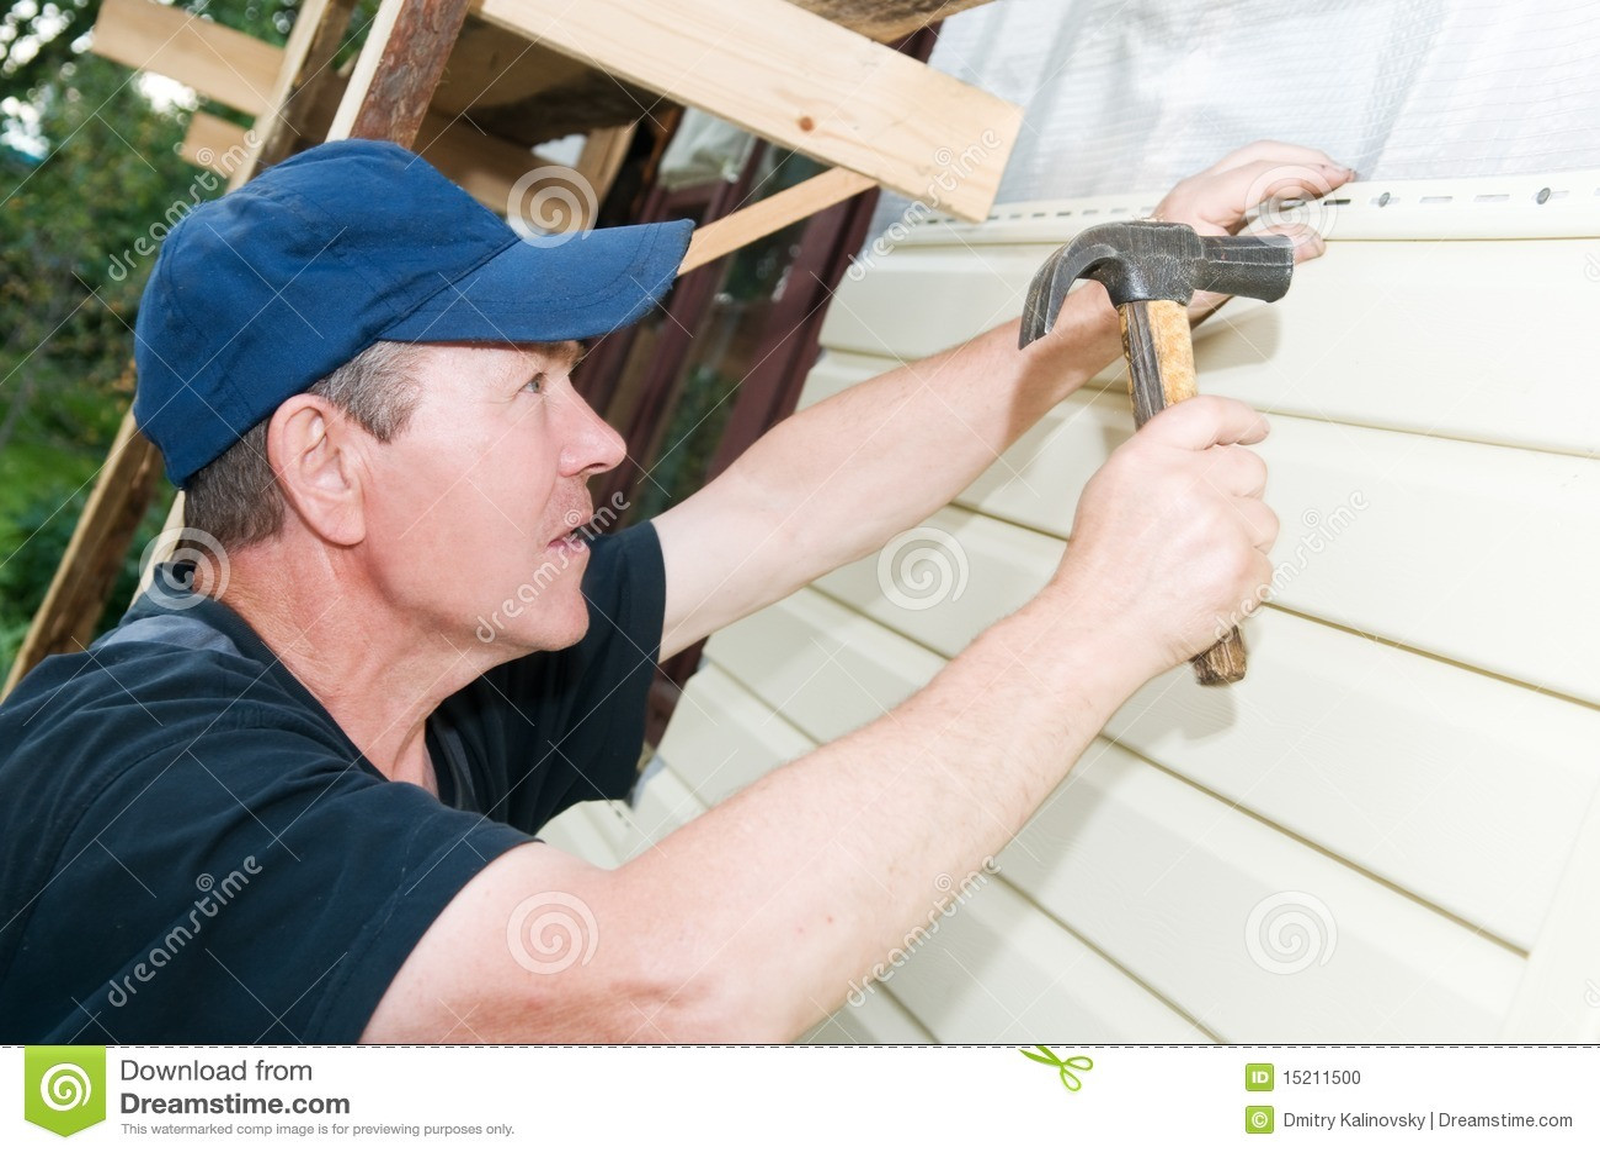 Ремонт дома сайдингом своими руками